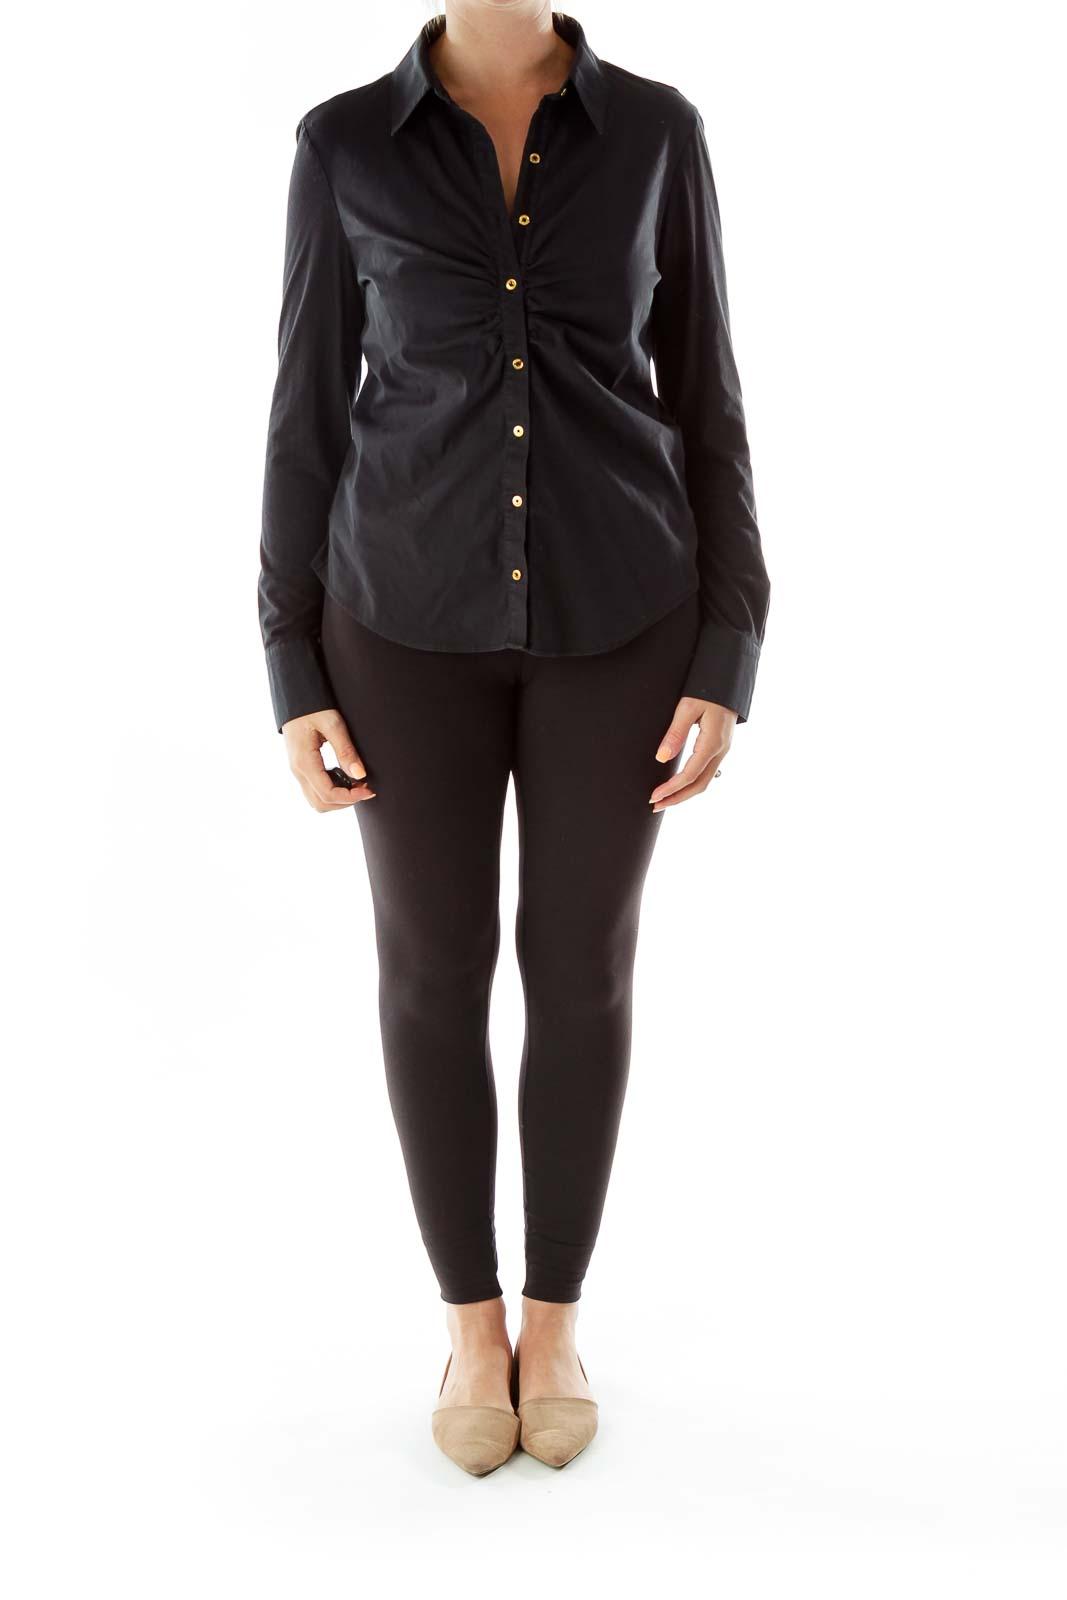 Black Collared Shirt